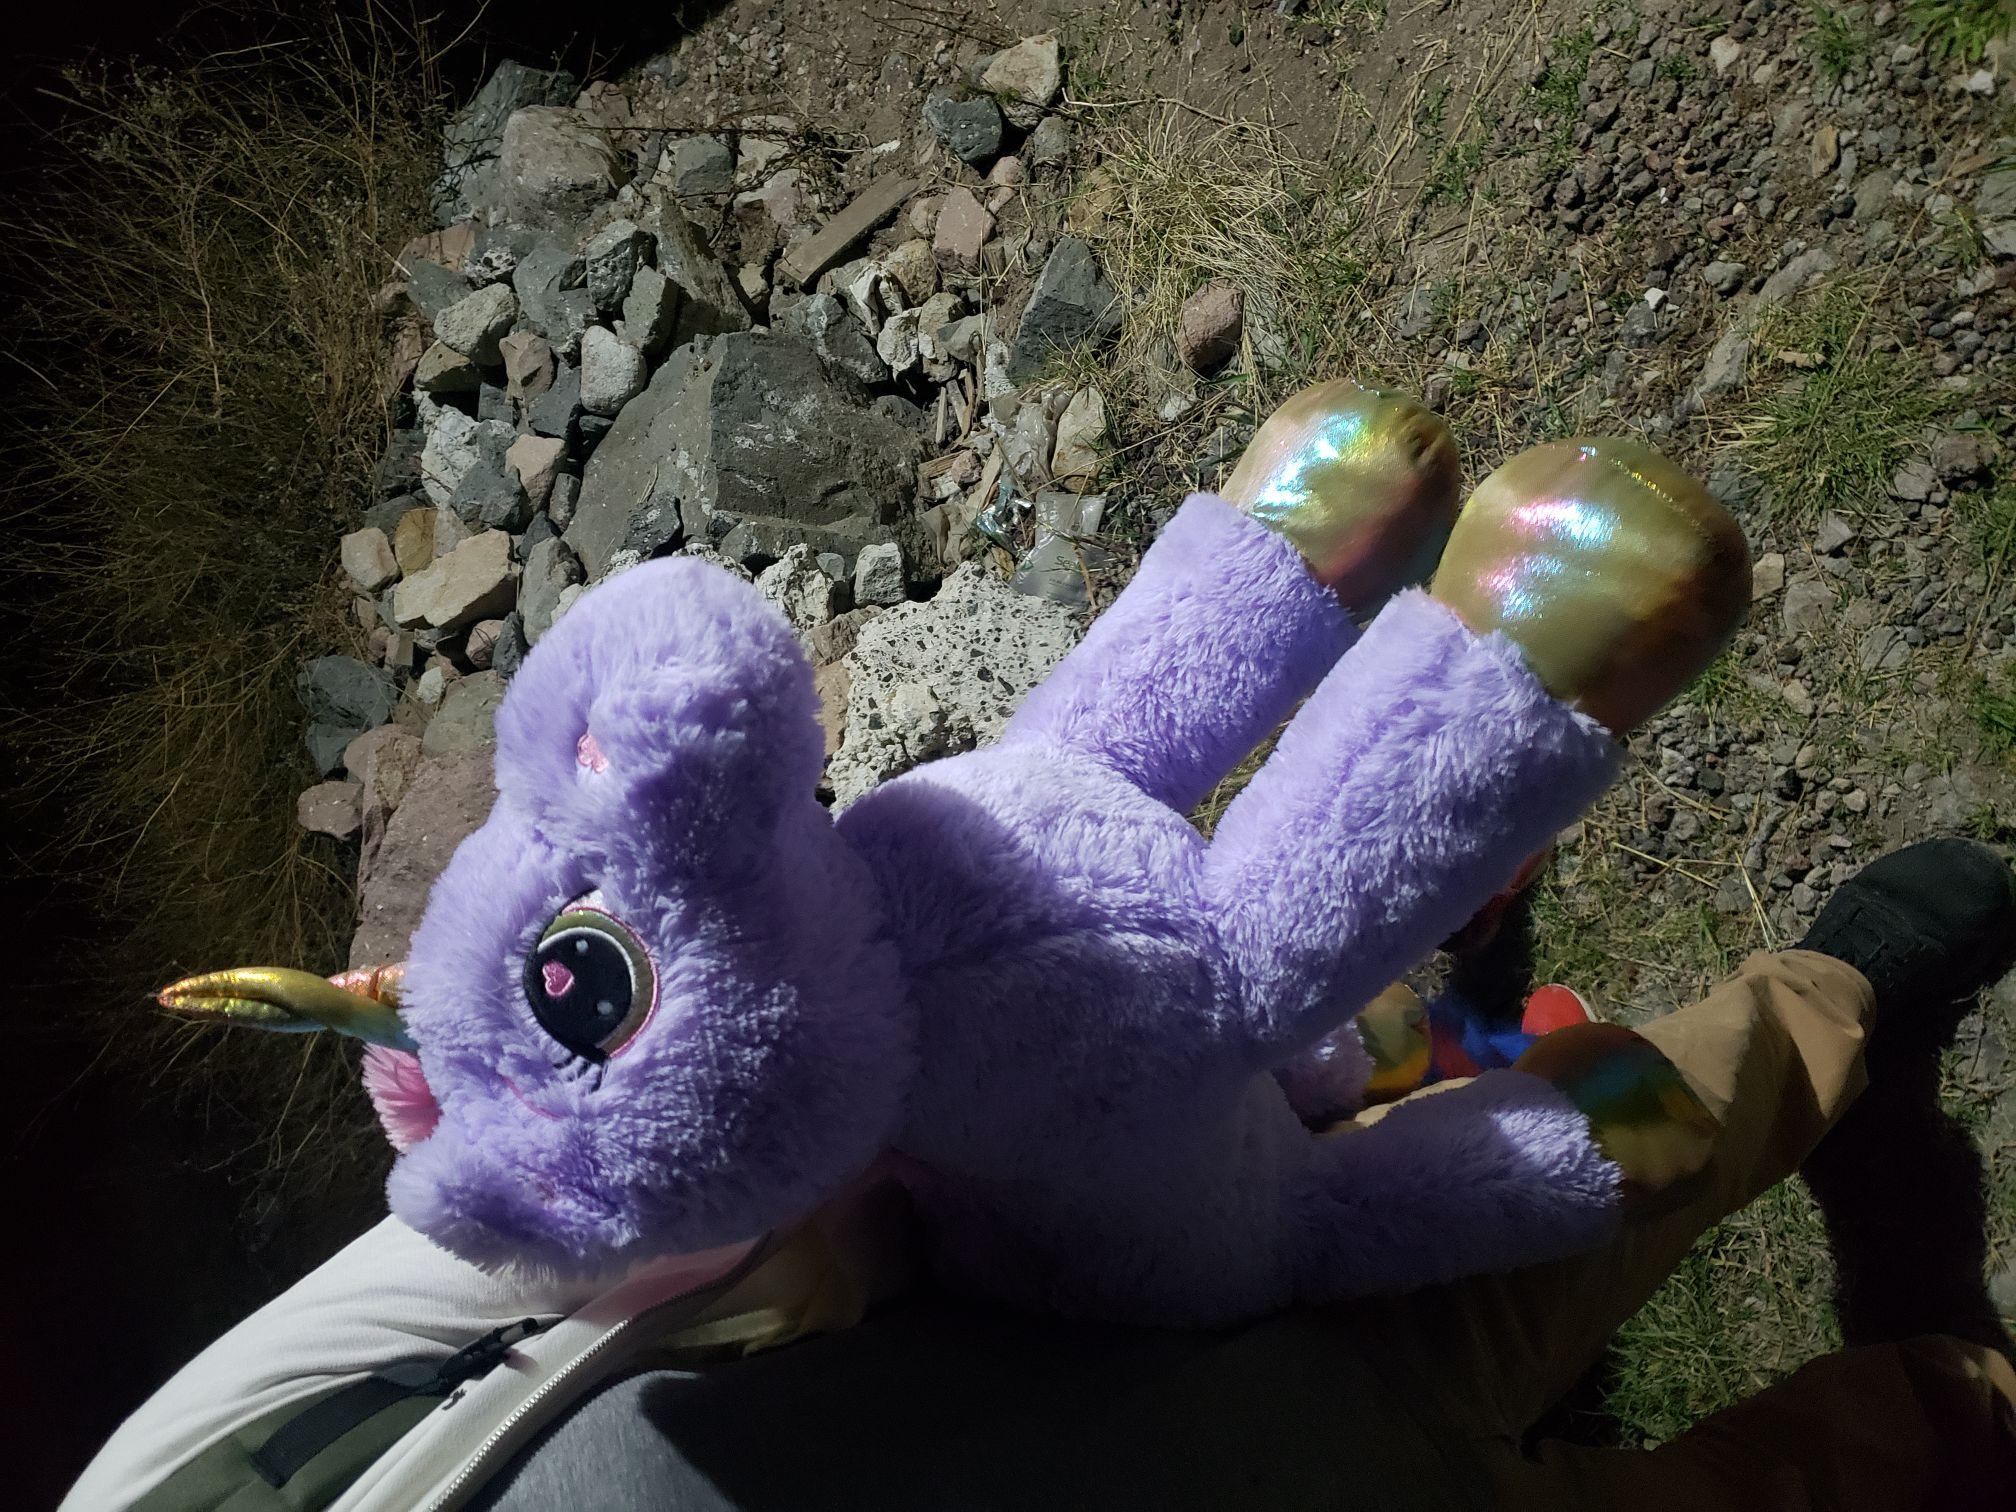 Bodega aurrera: unicornio